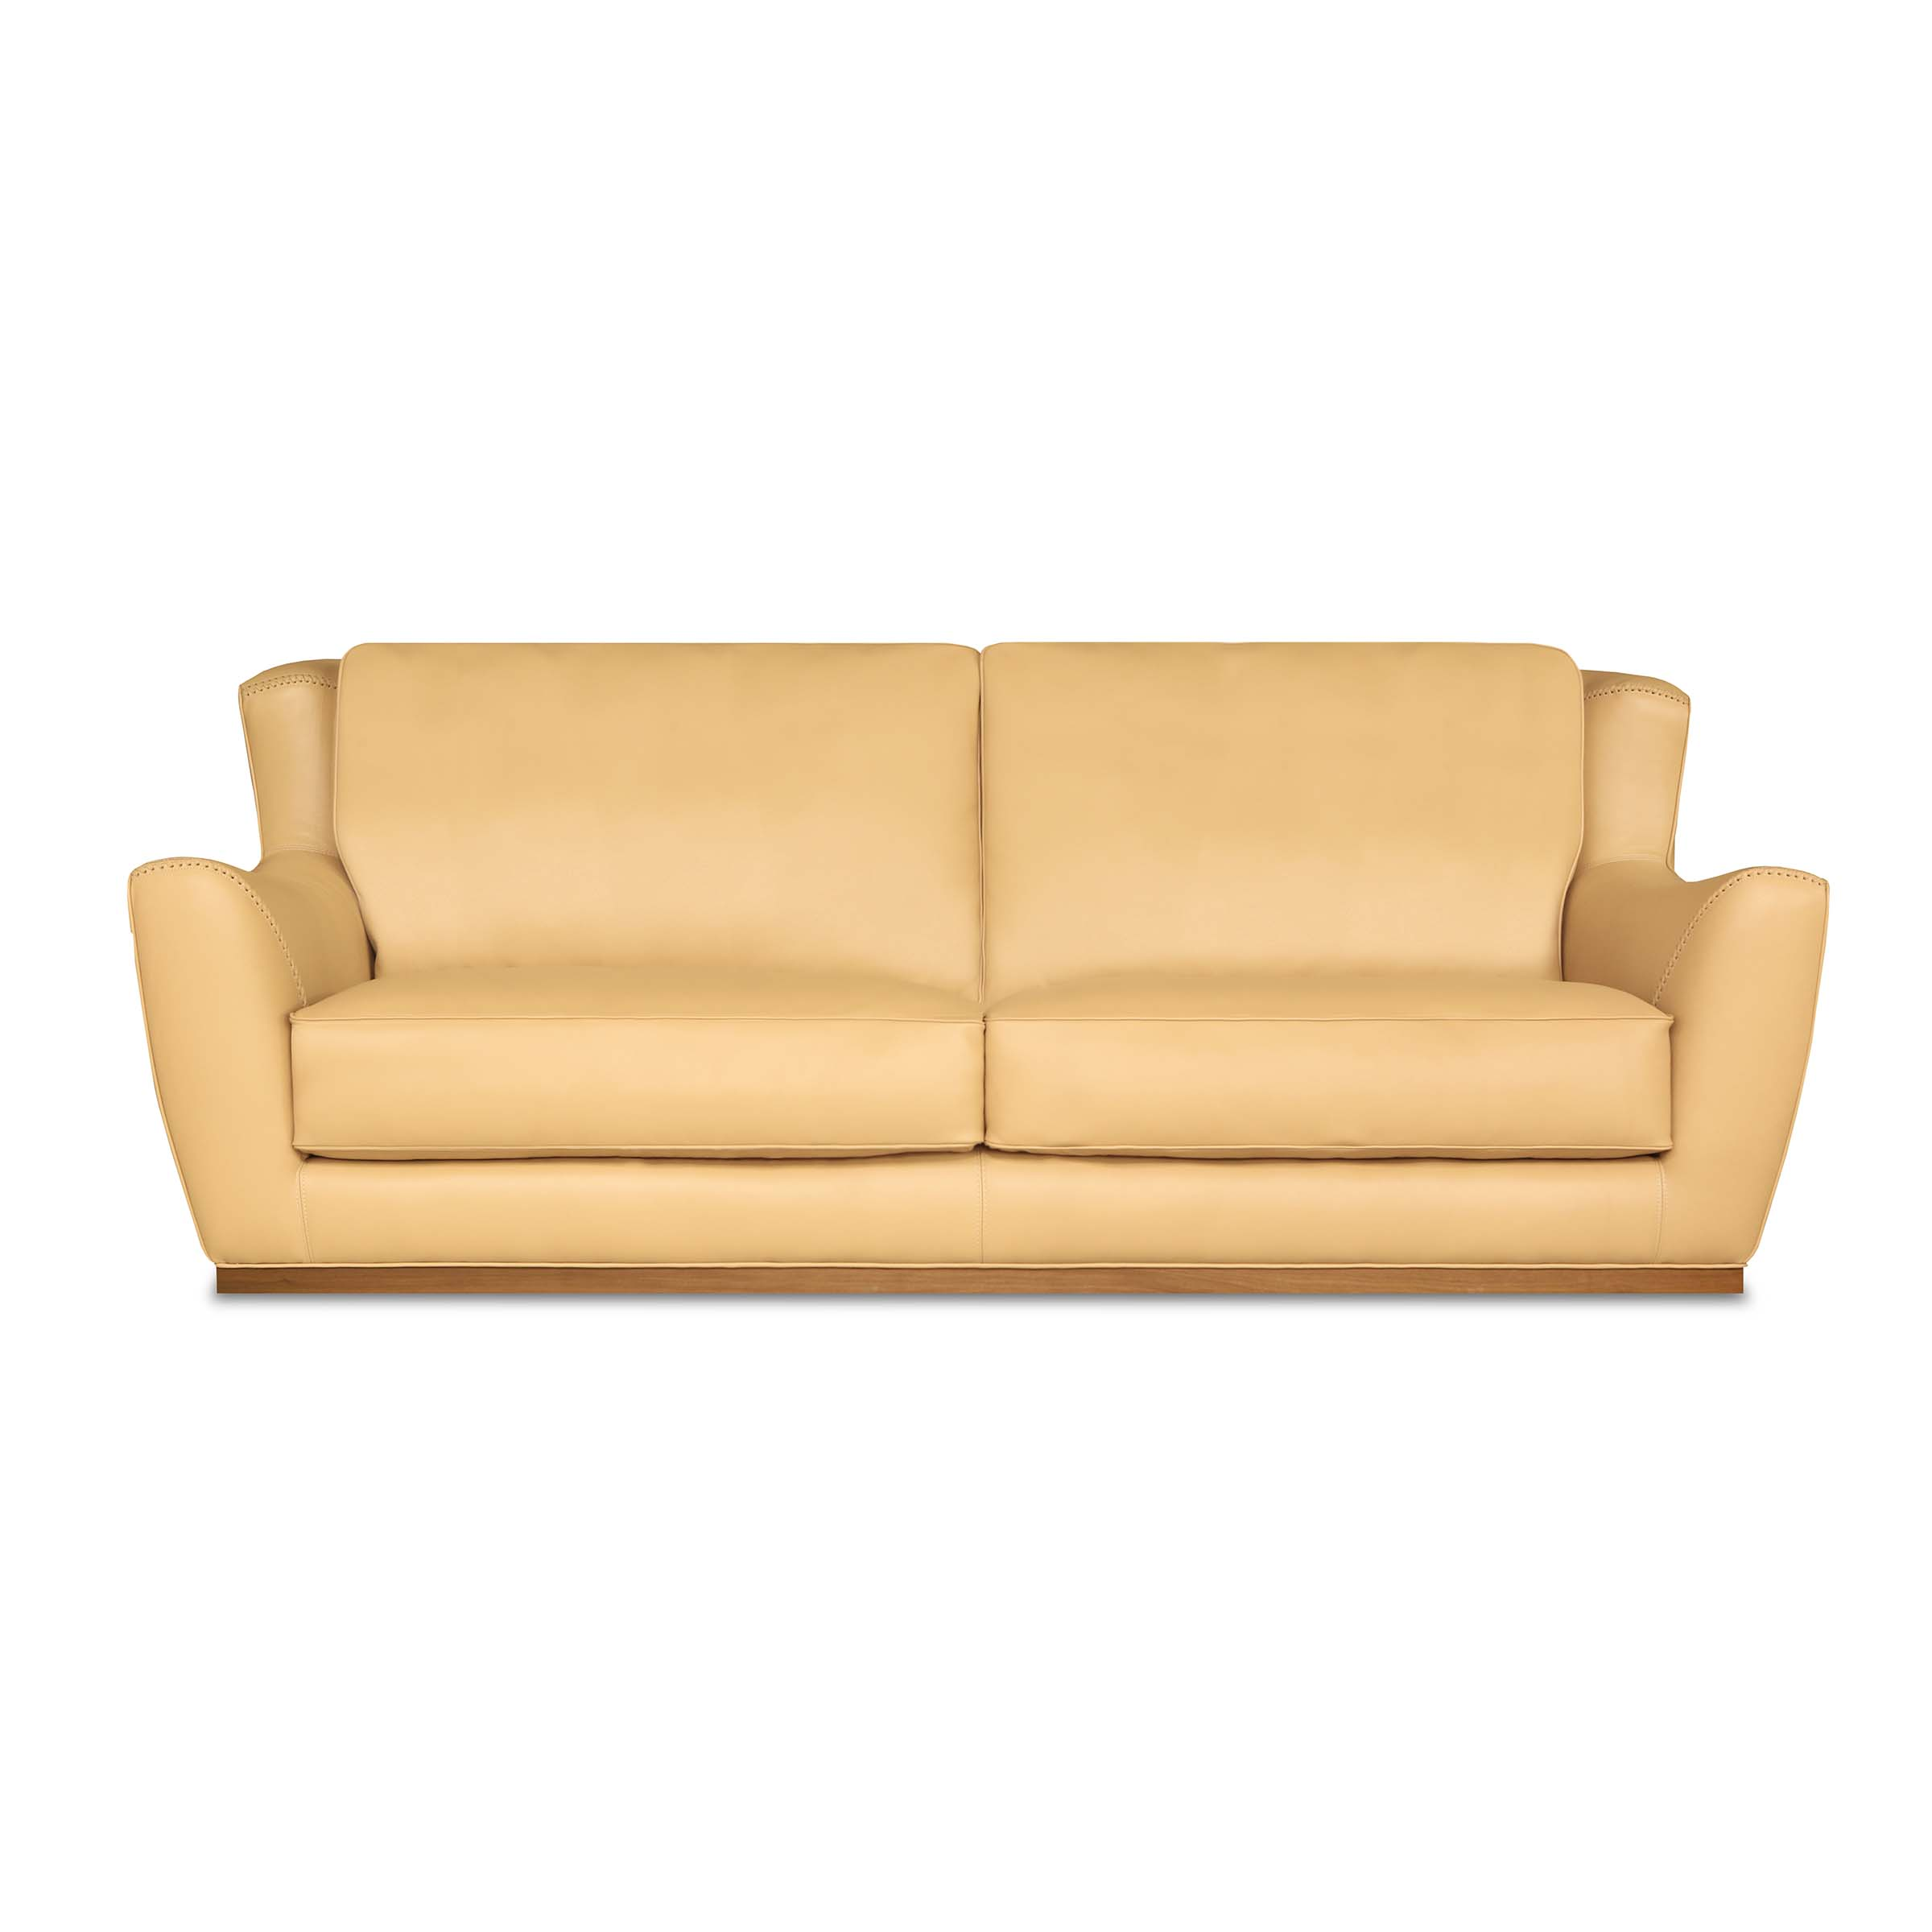 FITZGERALD - 30 Sofa Whipstitch Sorbet